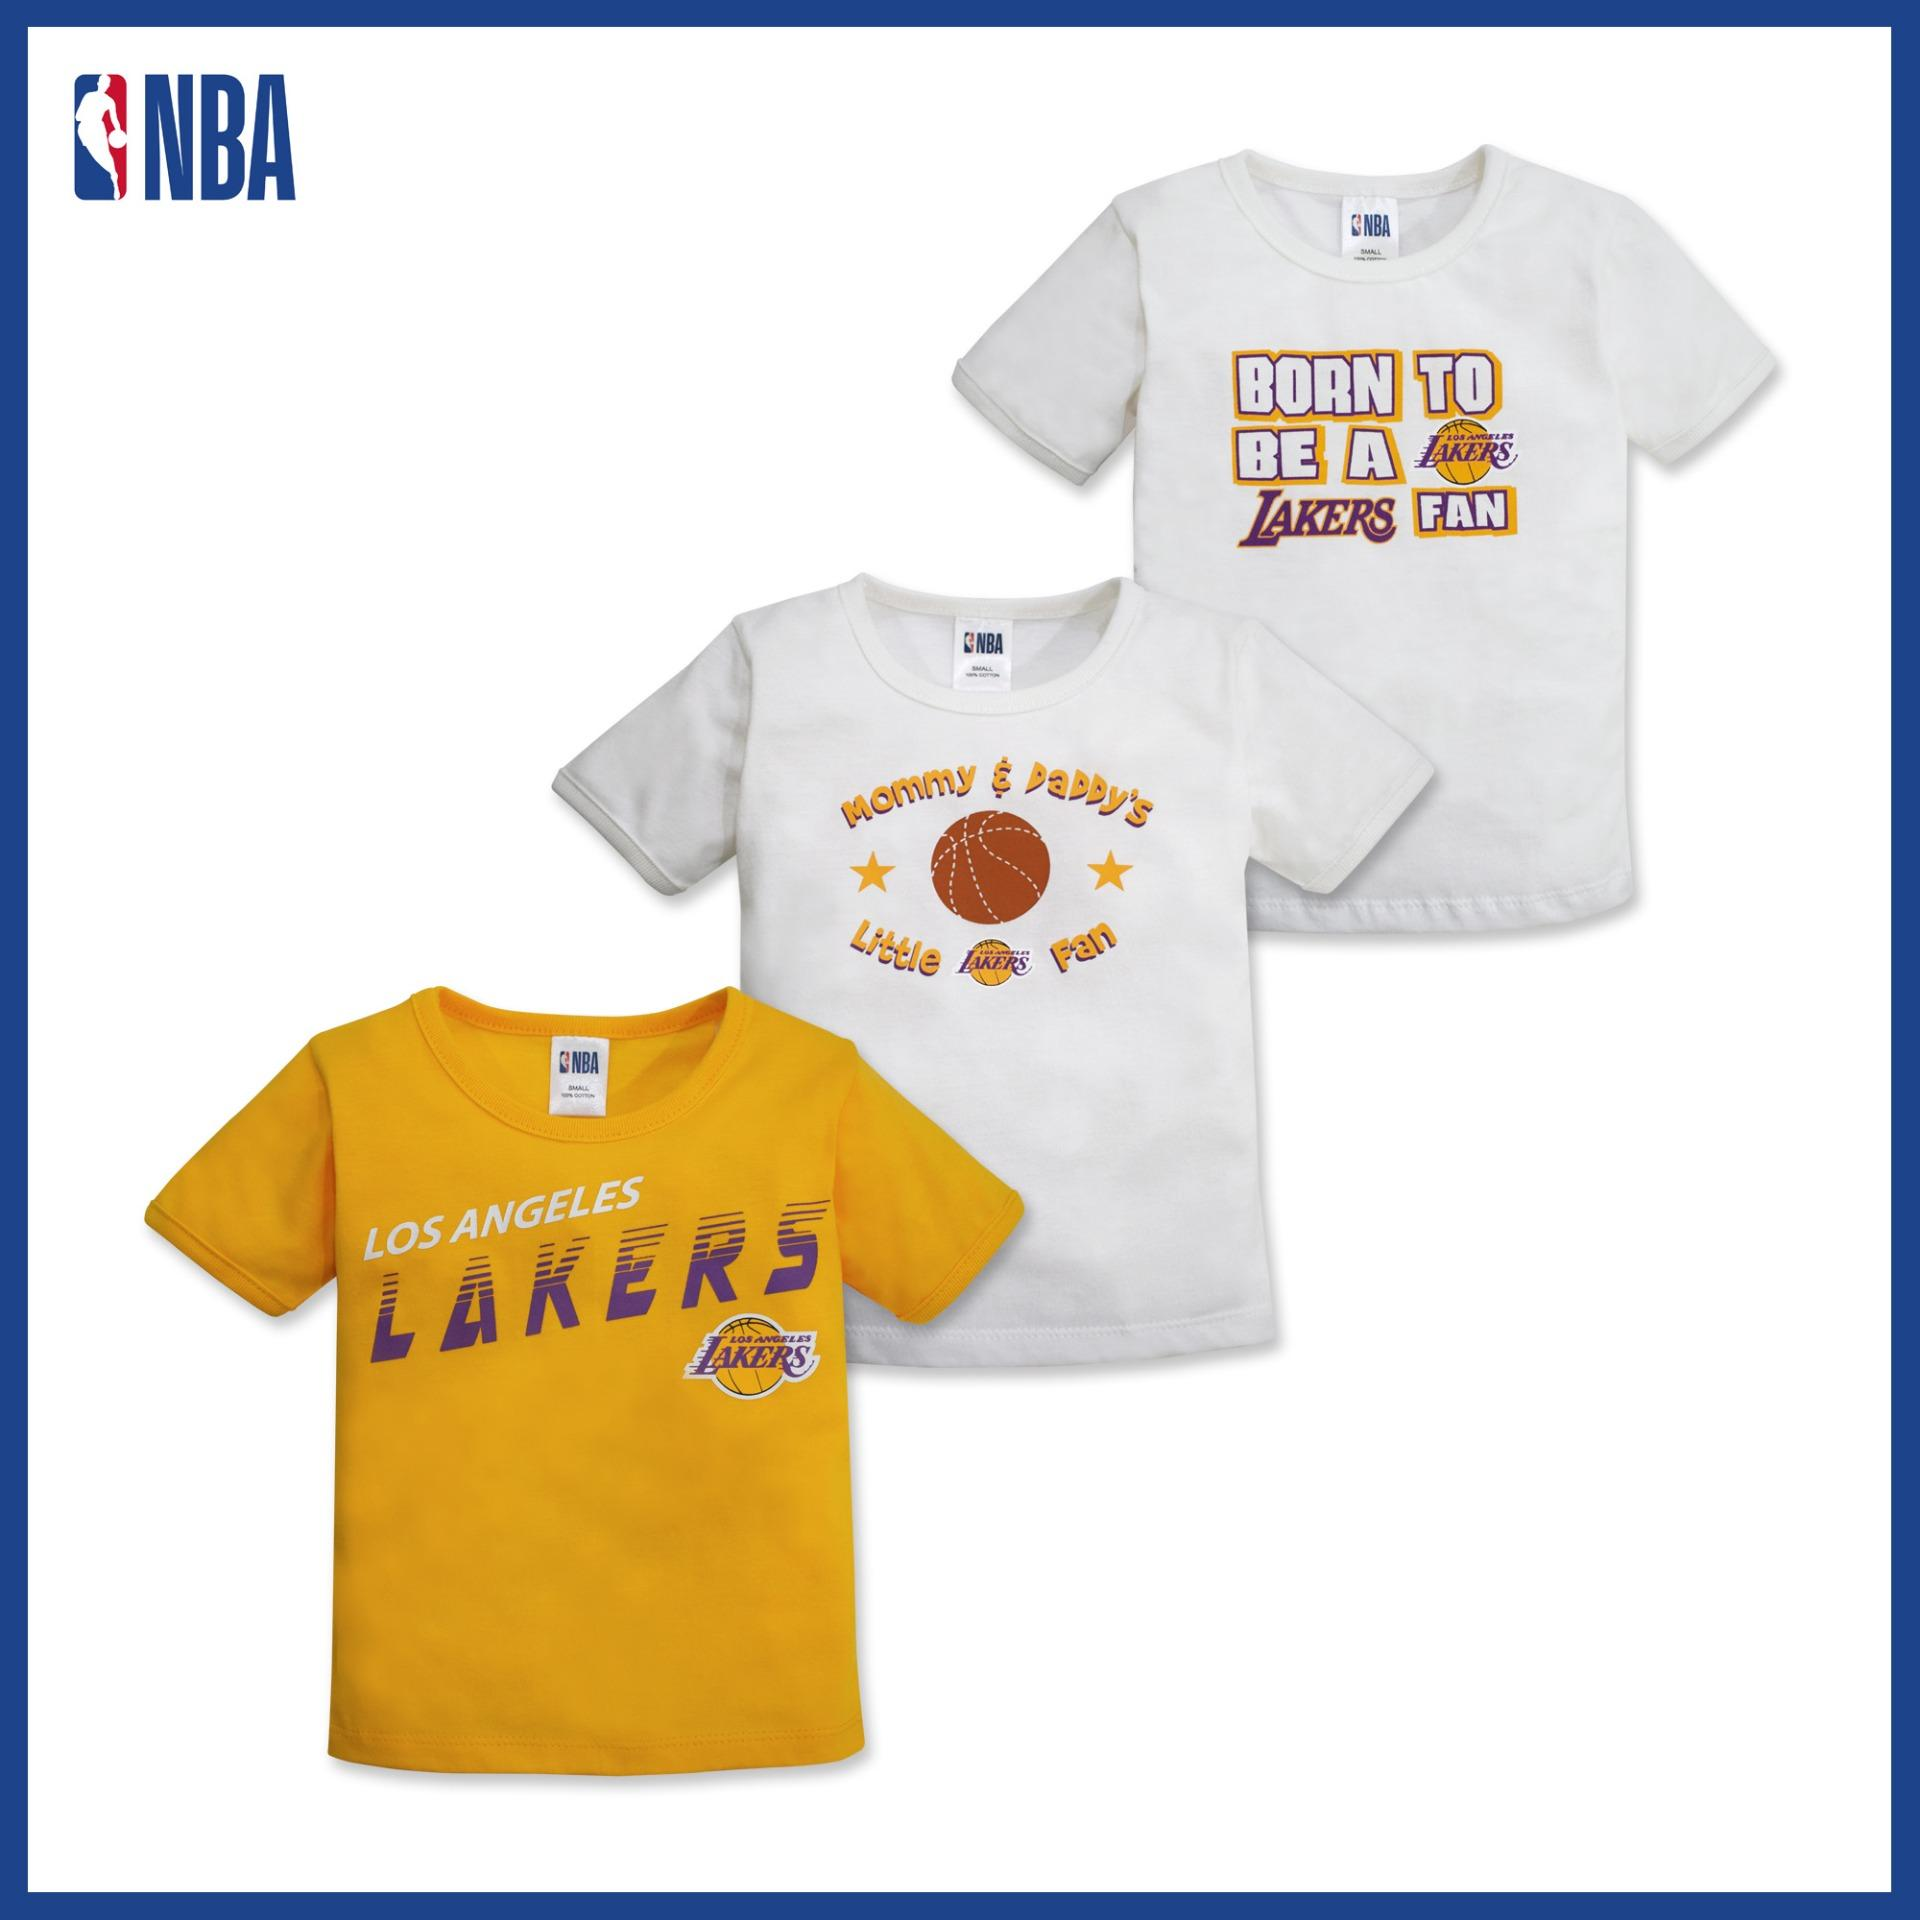 054697ccaef NBA Babies Philippines  NBA Babies price list - Muscle Shirts ...